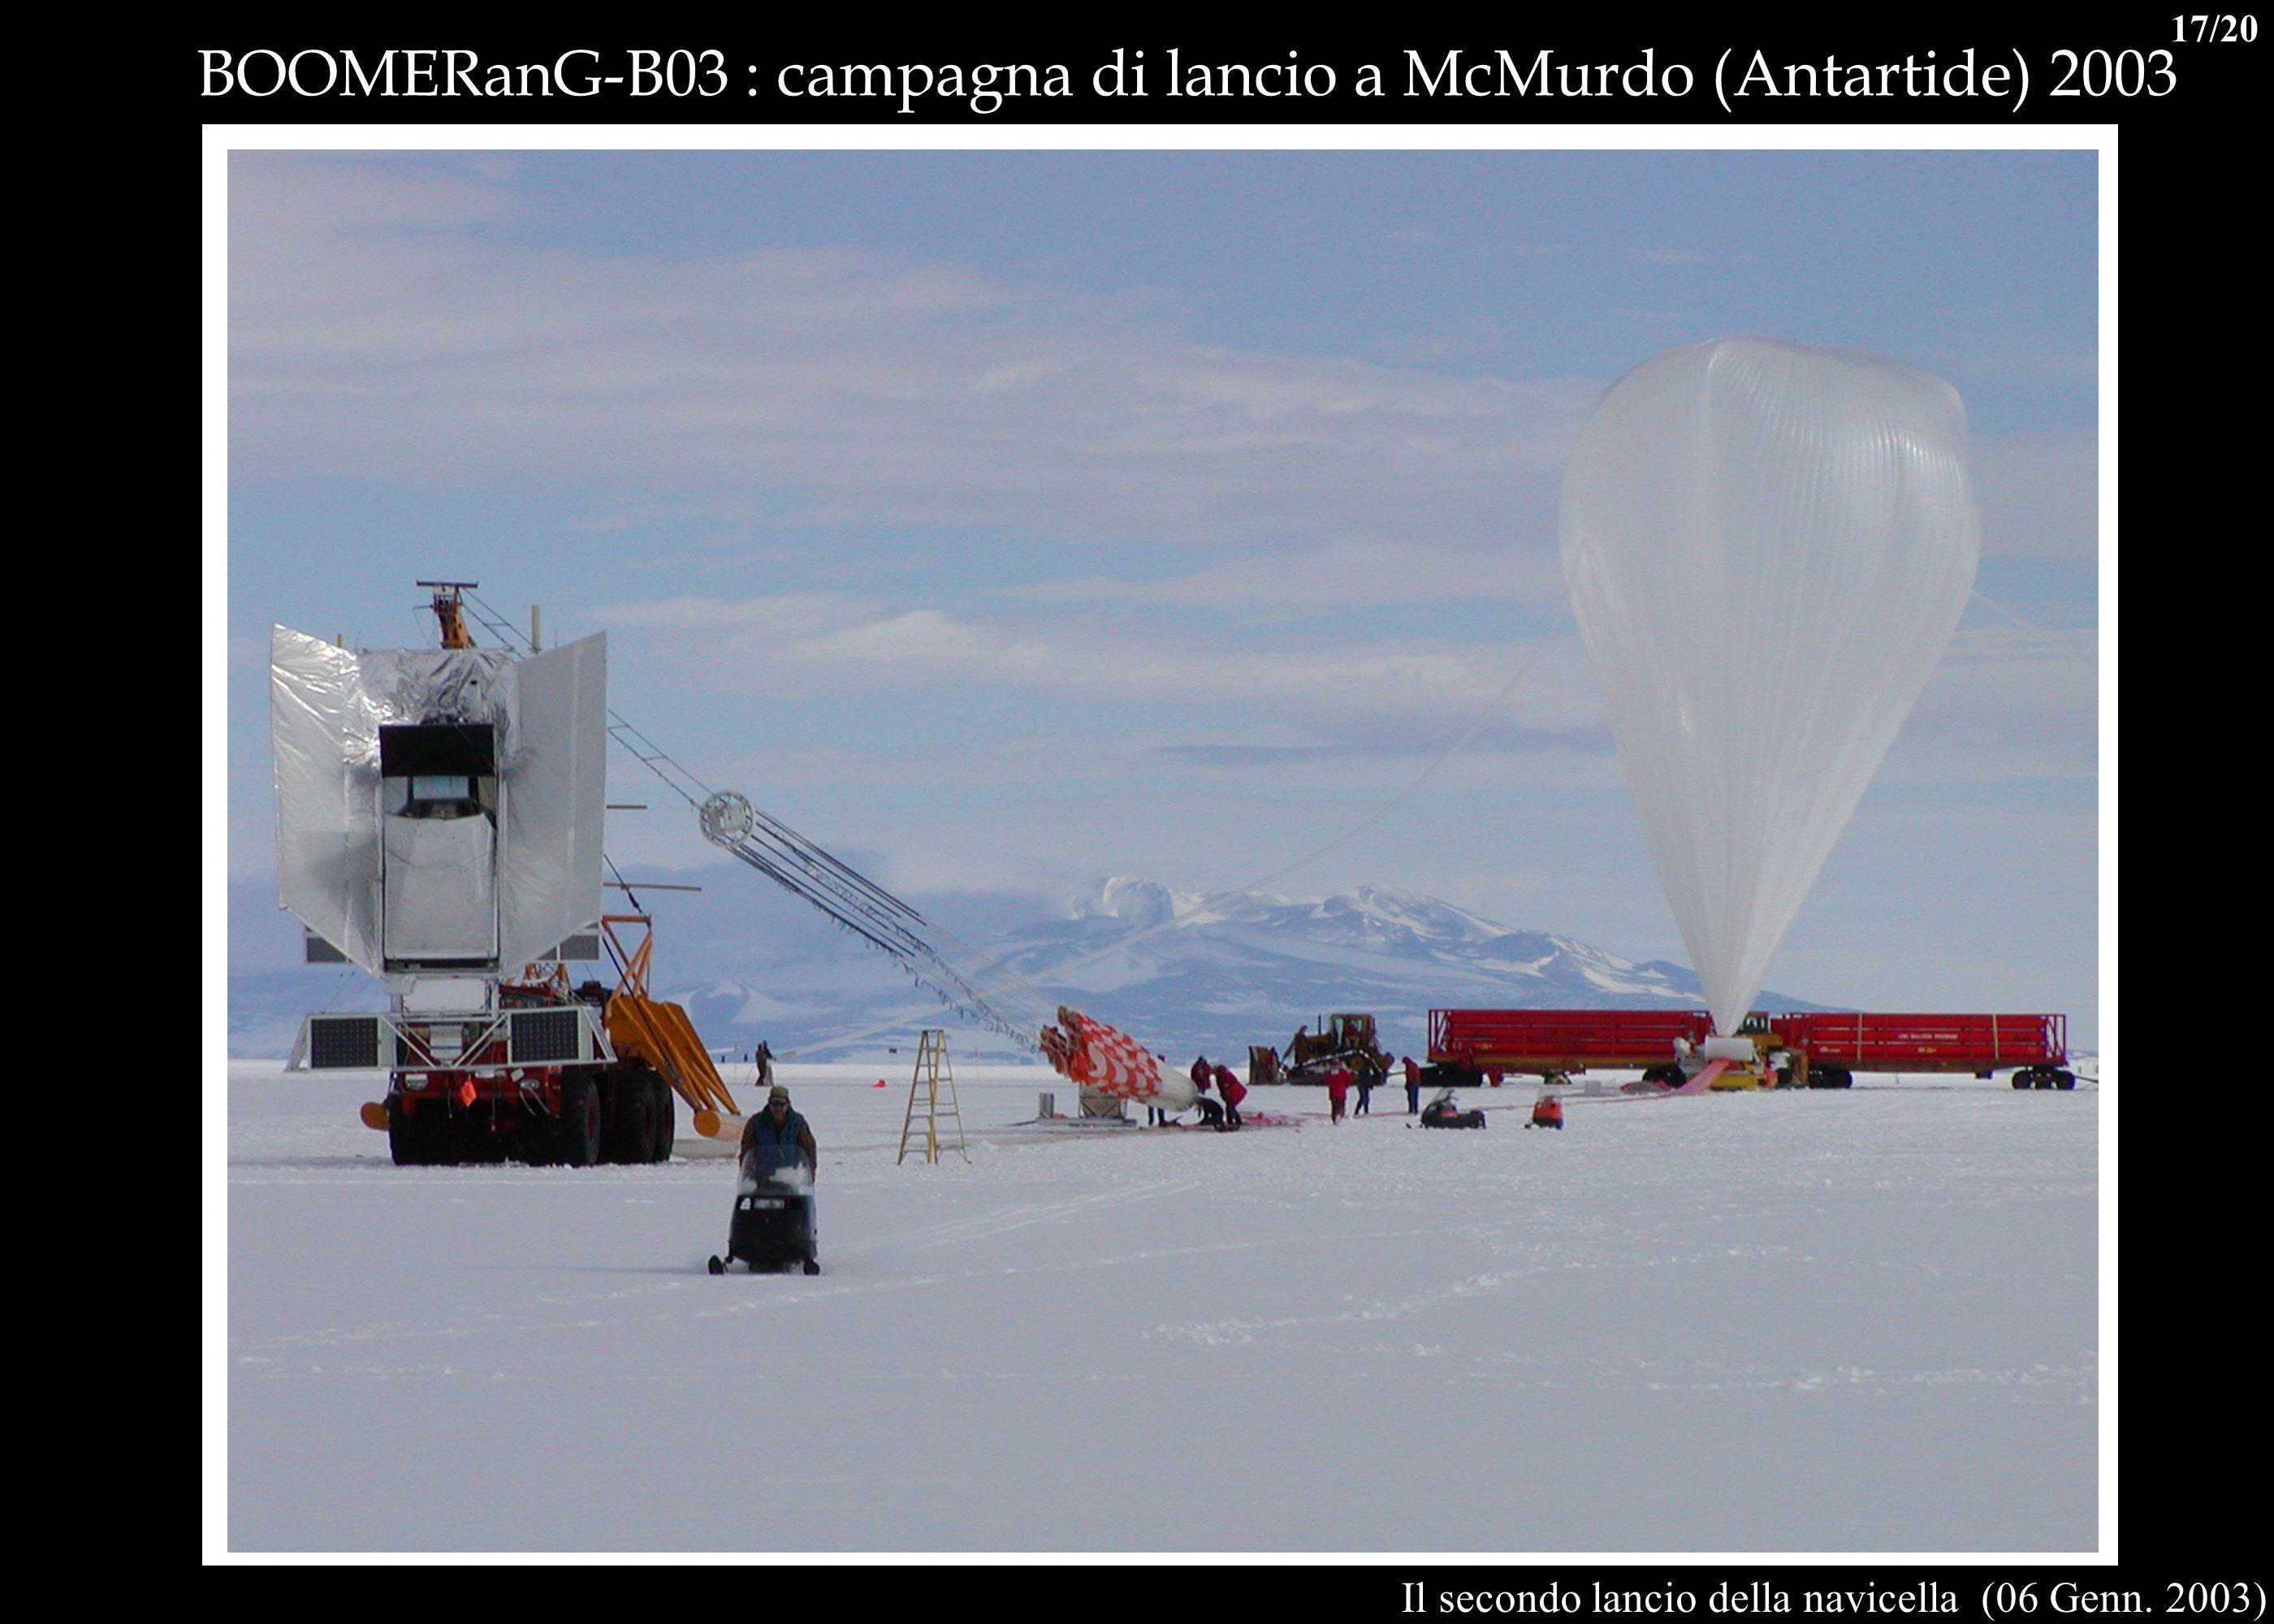 BOOMERanG-B03 : campagna di lancio a McMurdo (Antartide) 2003